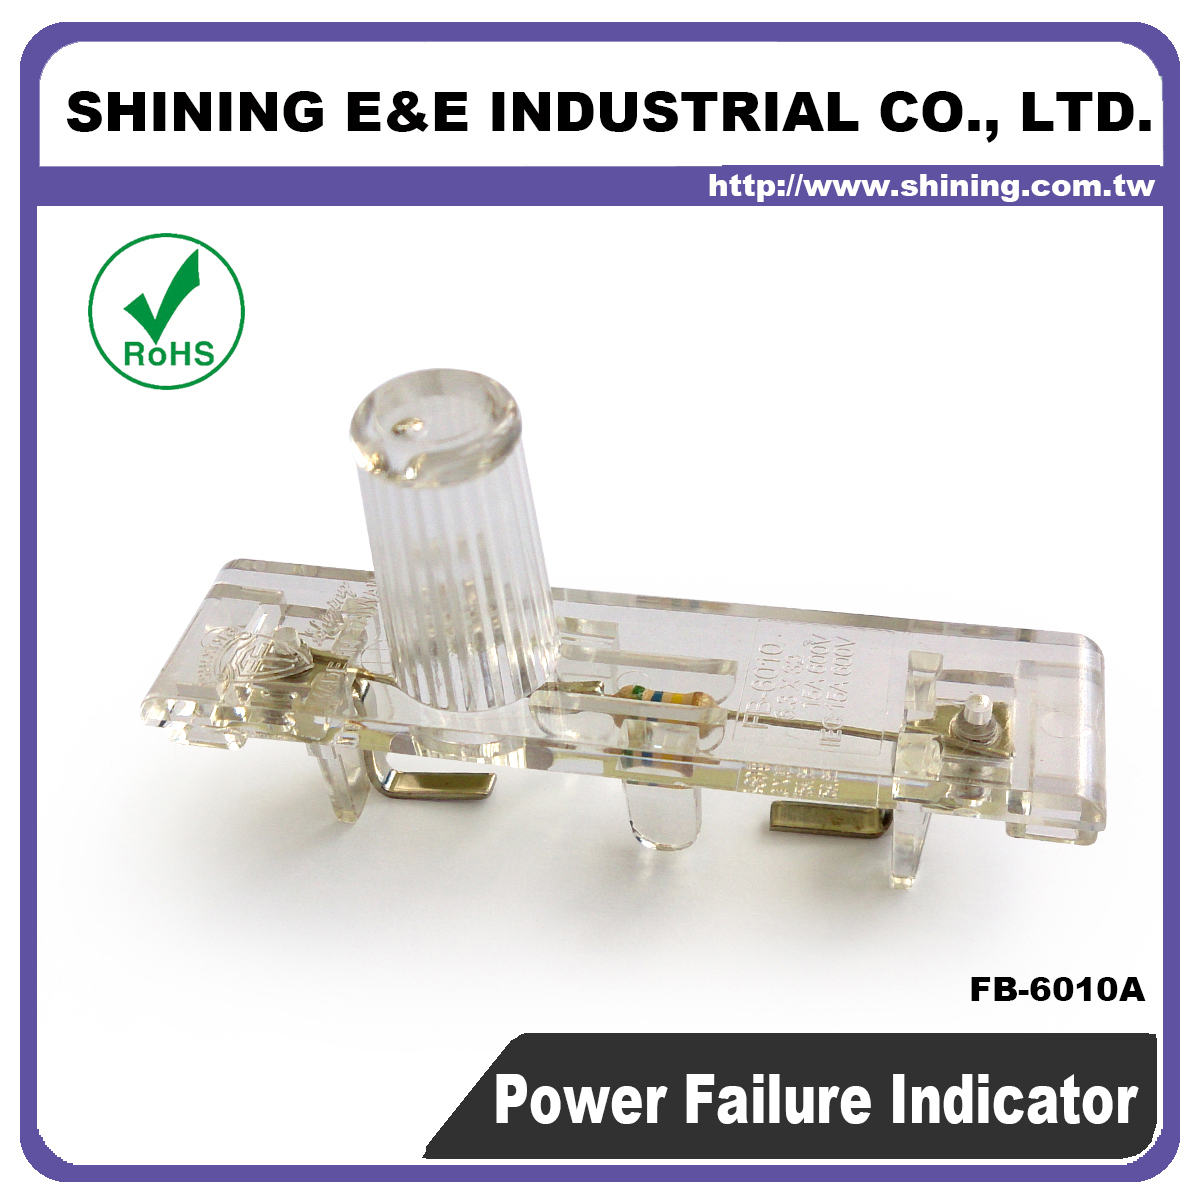 Taiwan Fb 6010a 380v Ac Fuse Block Led Power Failure Indicator Light Circuit